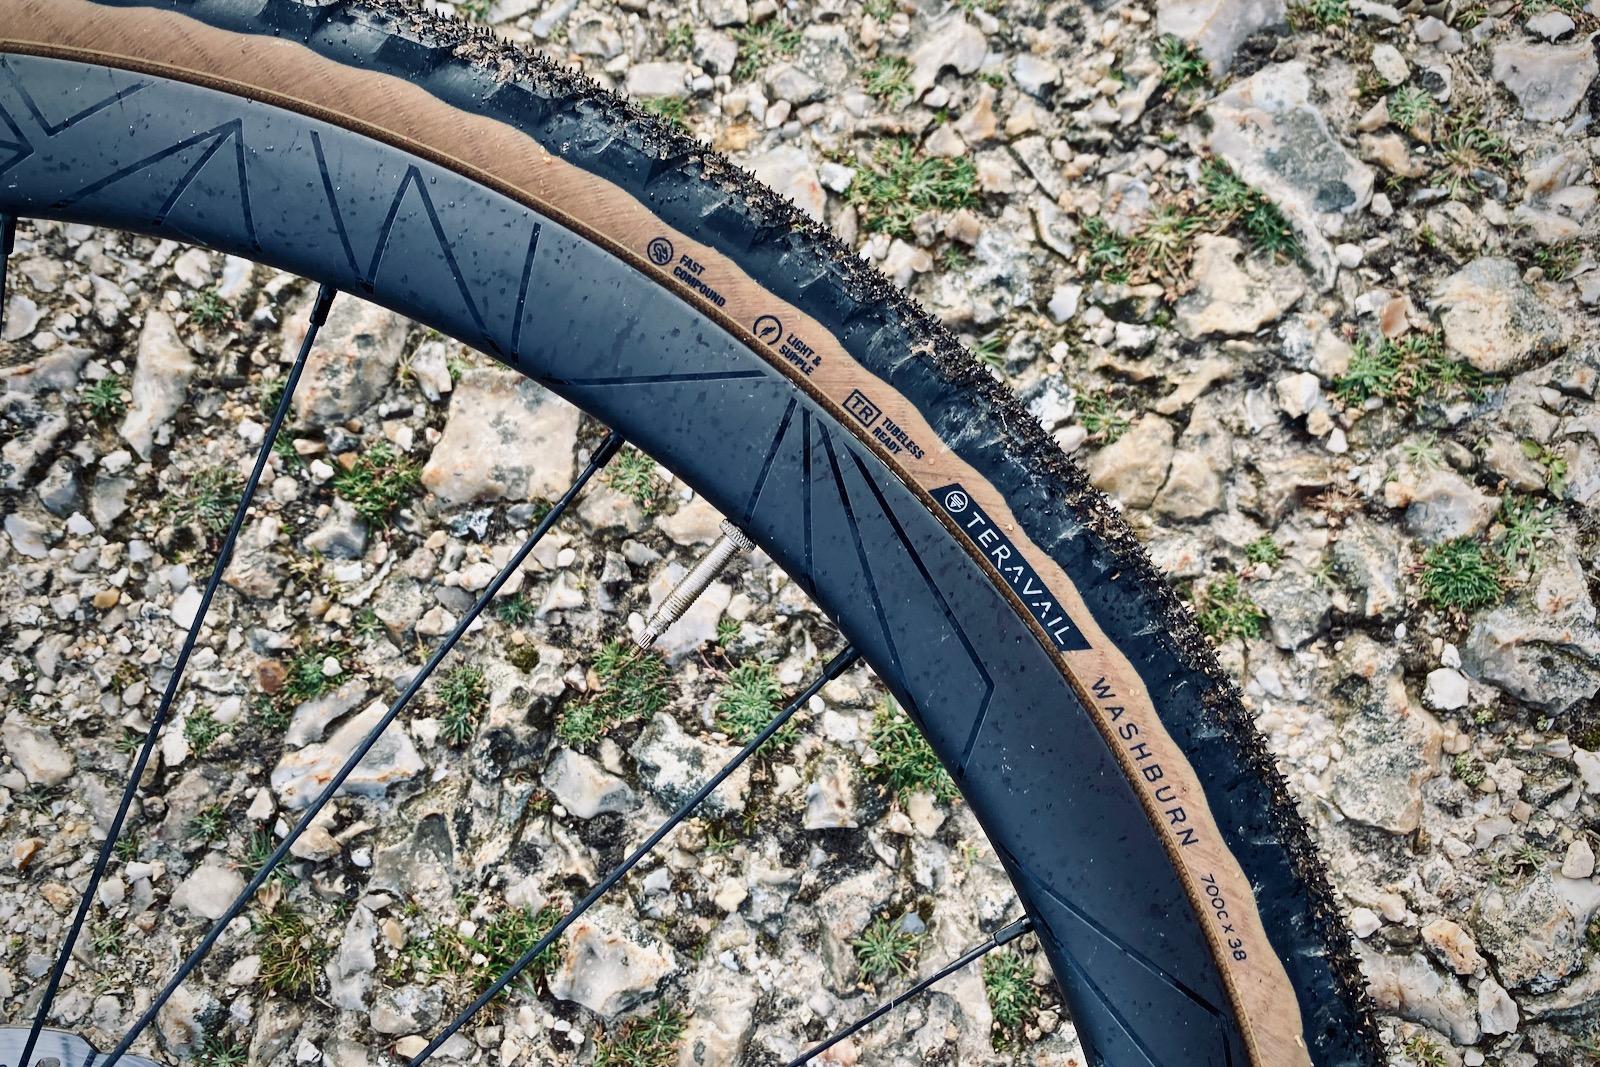 Teravail Washburn Tubeless Gravel Tyres